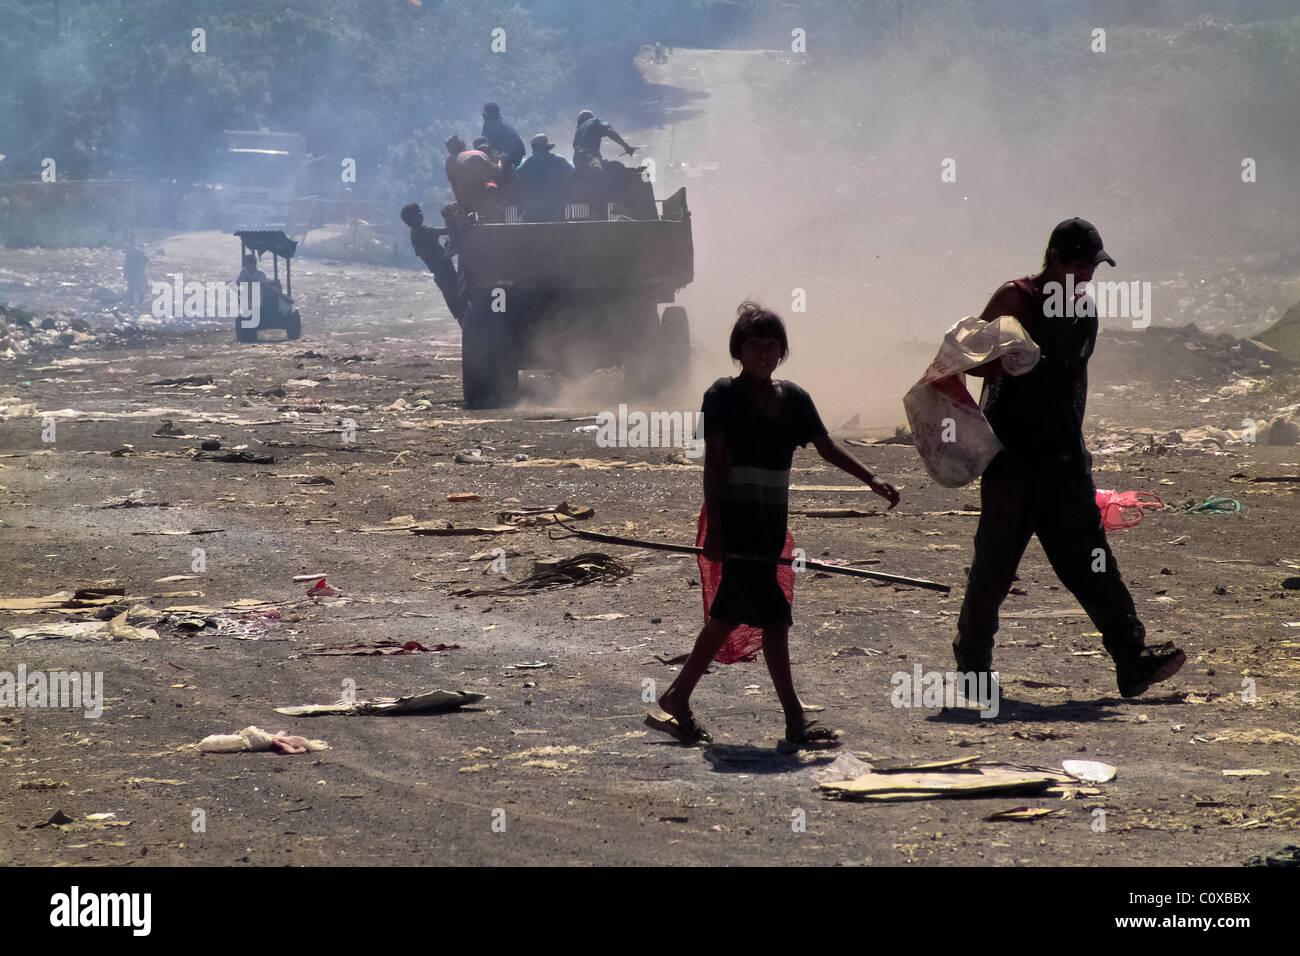 Nicaraguan garbage recollectors, walking in a dust cloud, work in the garbage dump La Chureca, Managua, Nicaragua. - Stock Image